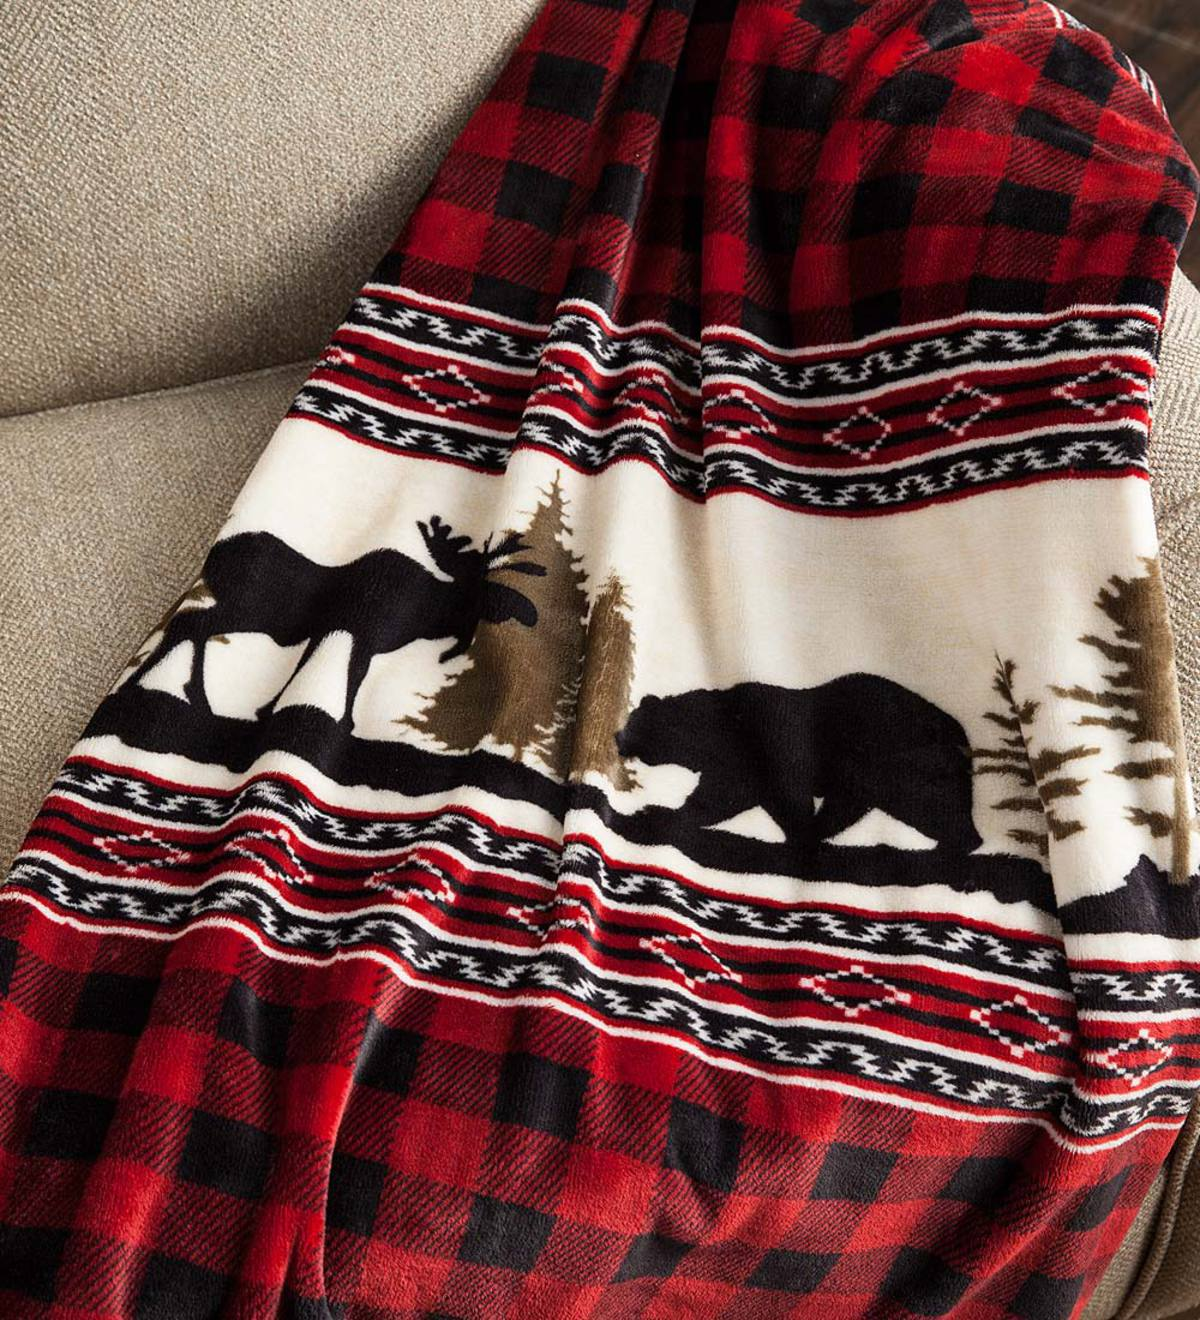 Wilderness Buffalo Plaid Fleece Throw Plowhearth